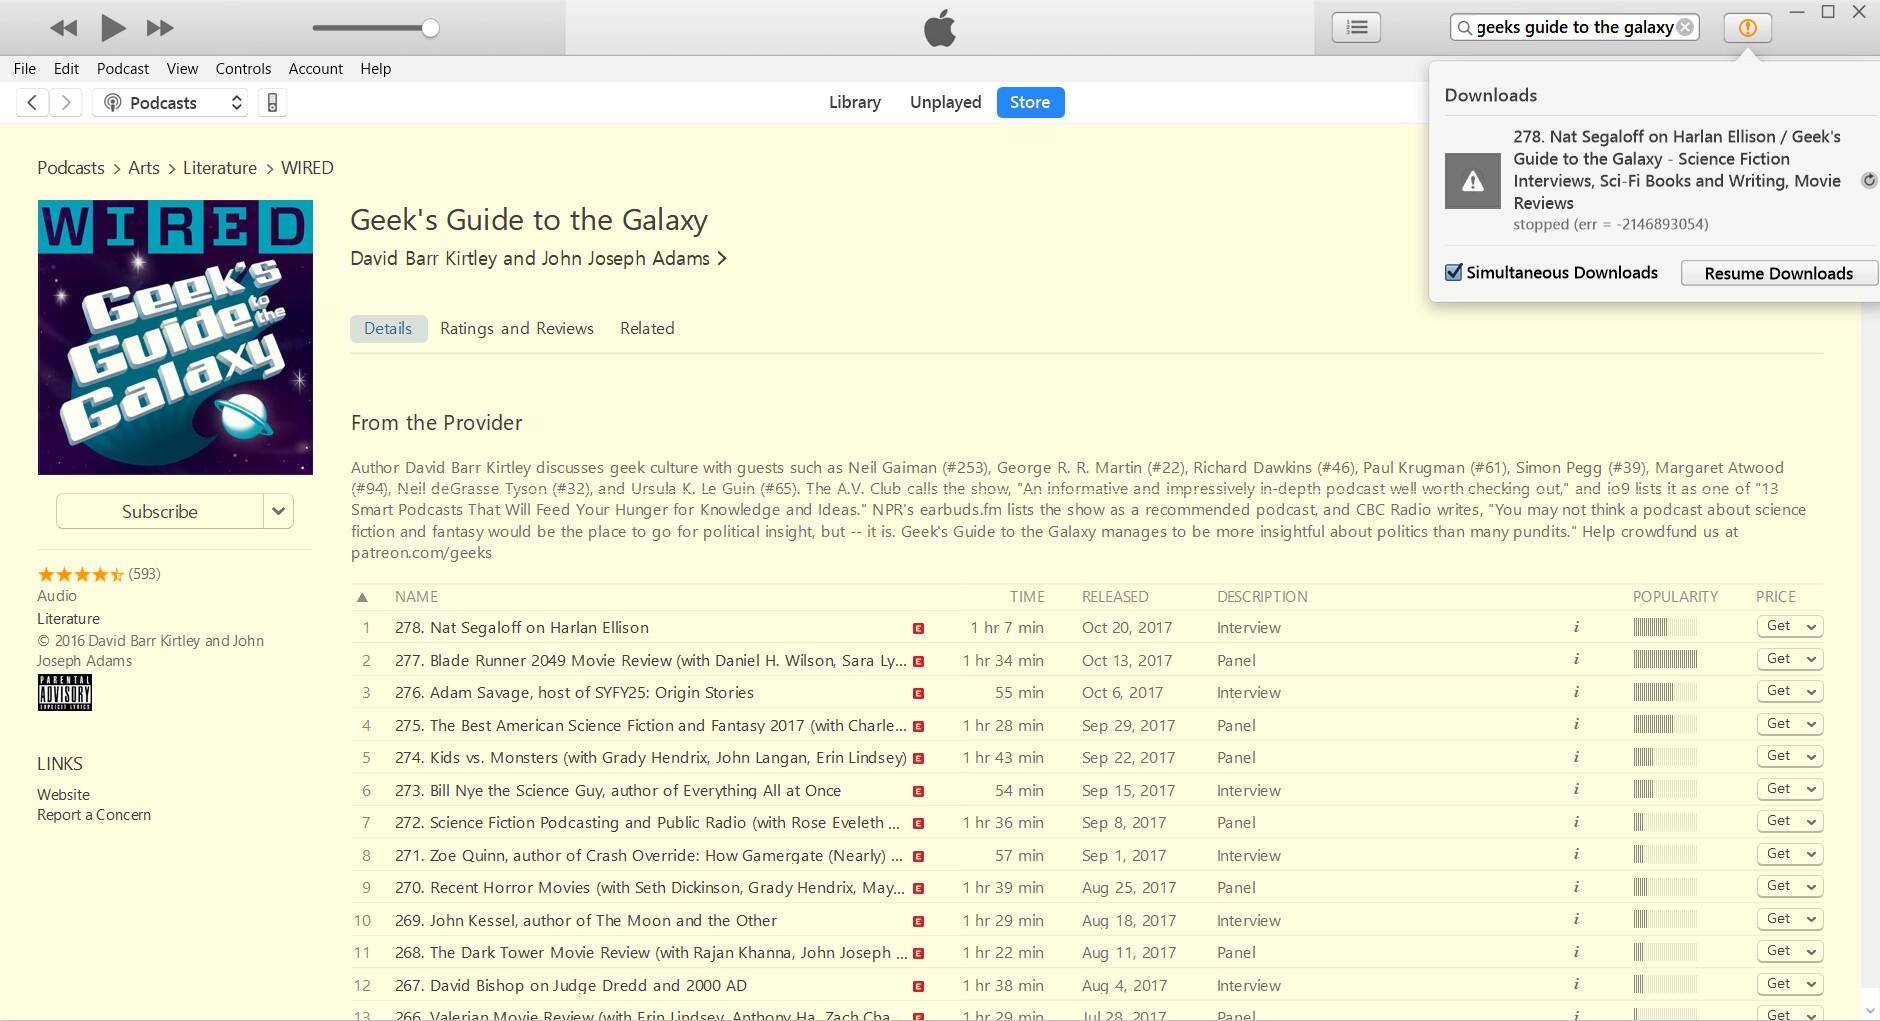 Itunes podcast download error 2146893054 - Apple Community